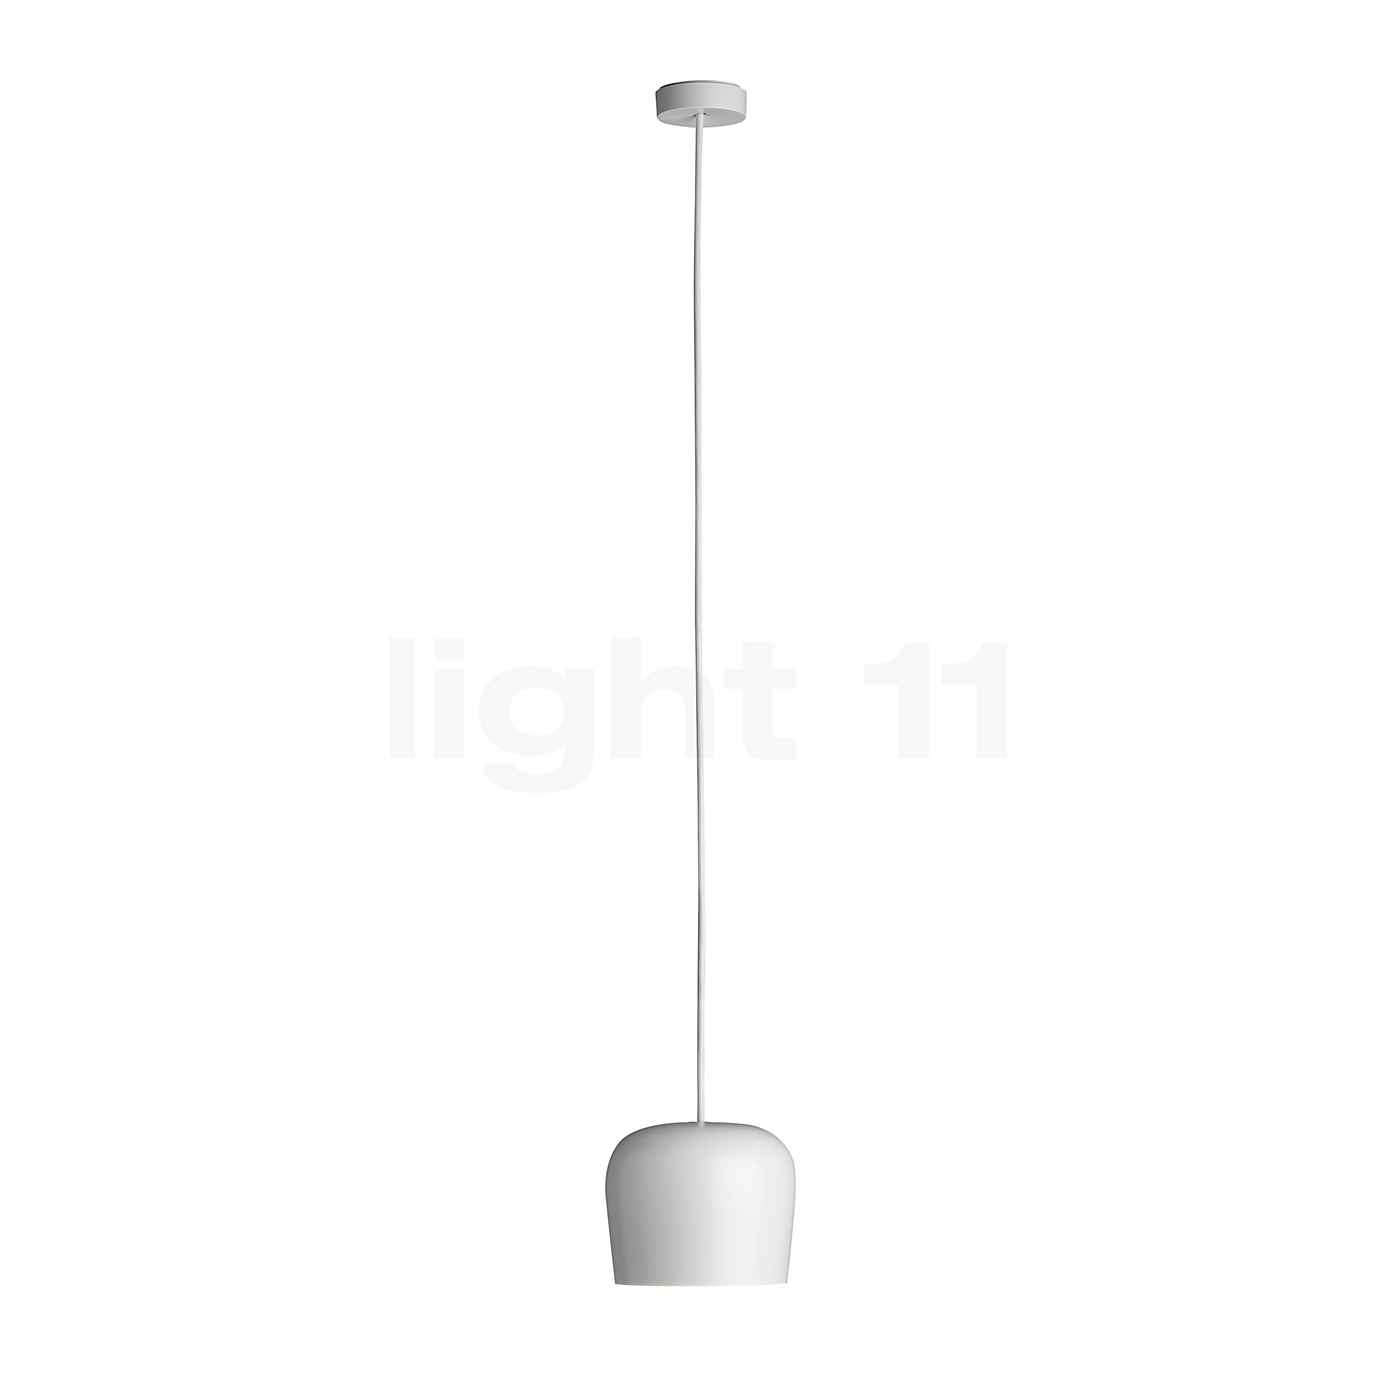 Flos aim small fix sospensione led pendant lights buy at for Sospensione flos